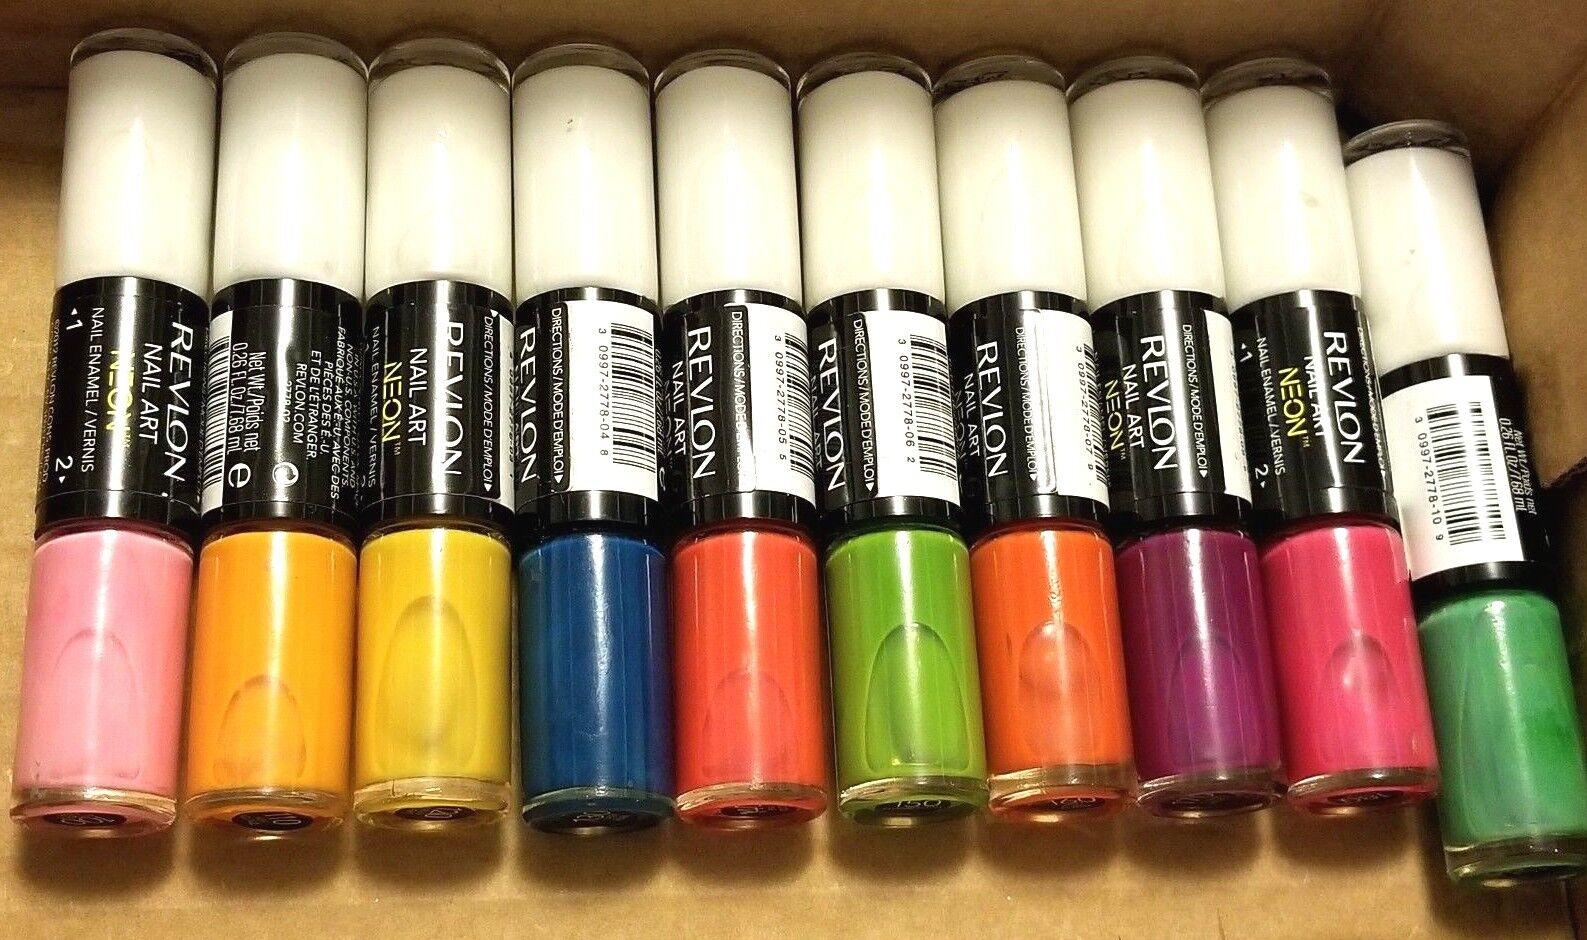 Revlon Nail Art Expressionist Enamel Polish - 350 Ulterior Motif | eBay